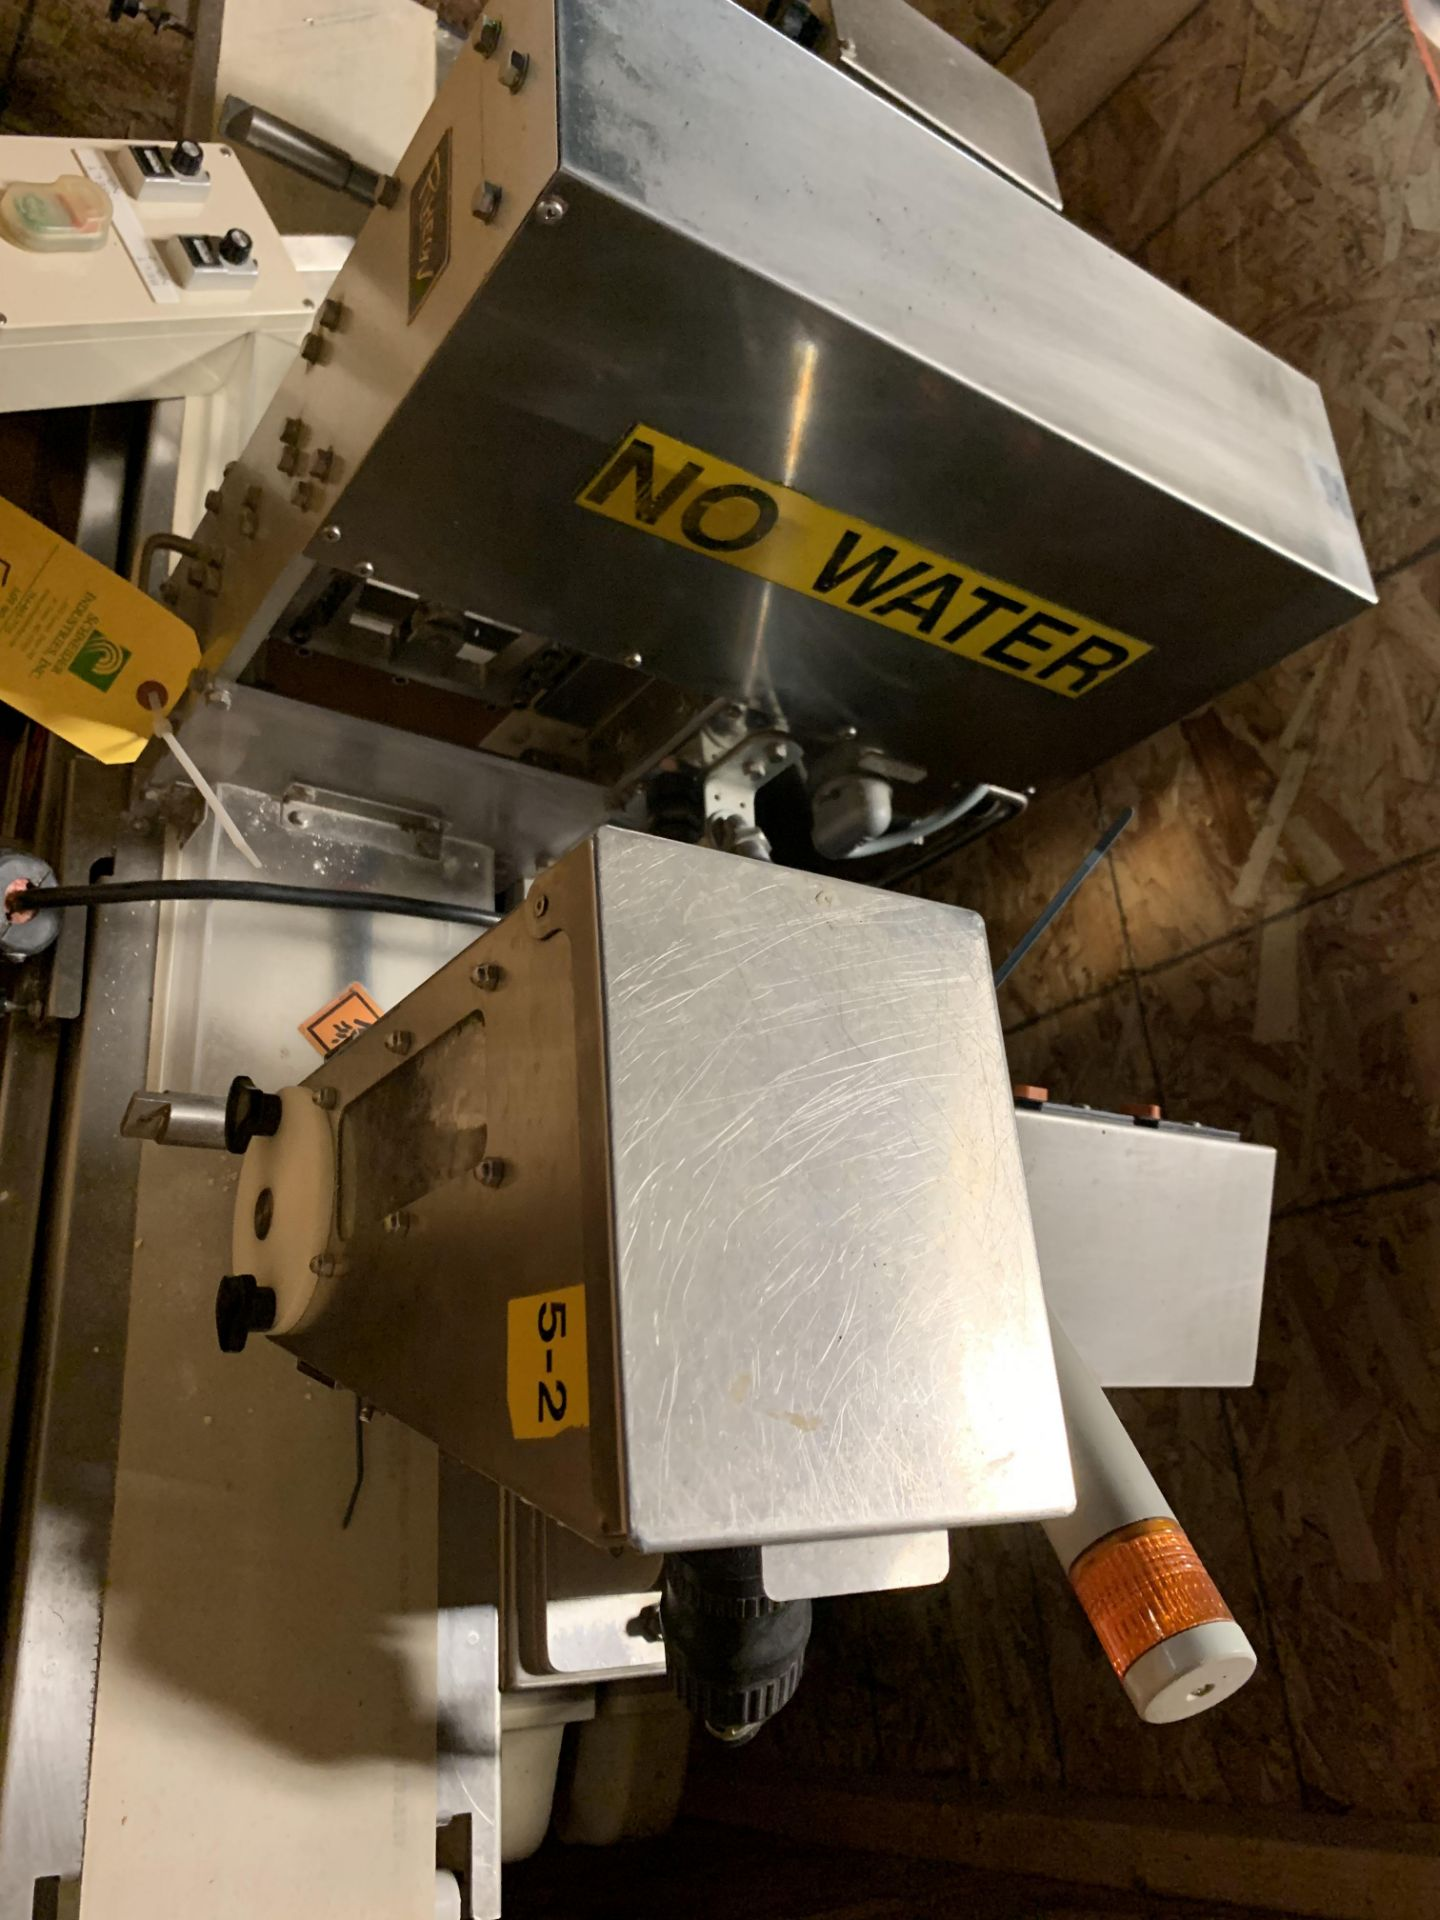 Rheon Vertical Cross Cutter Model GK420, Loading Fee $100 - Image 3 of 4